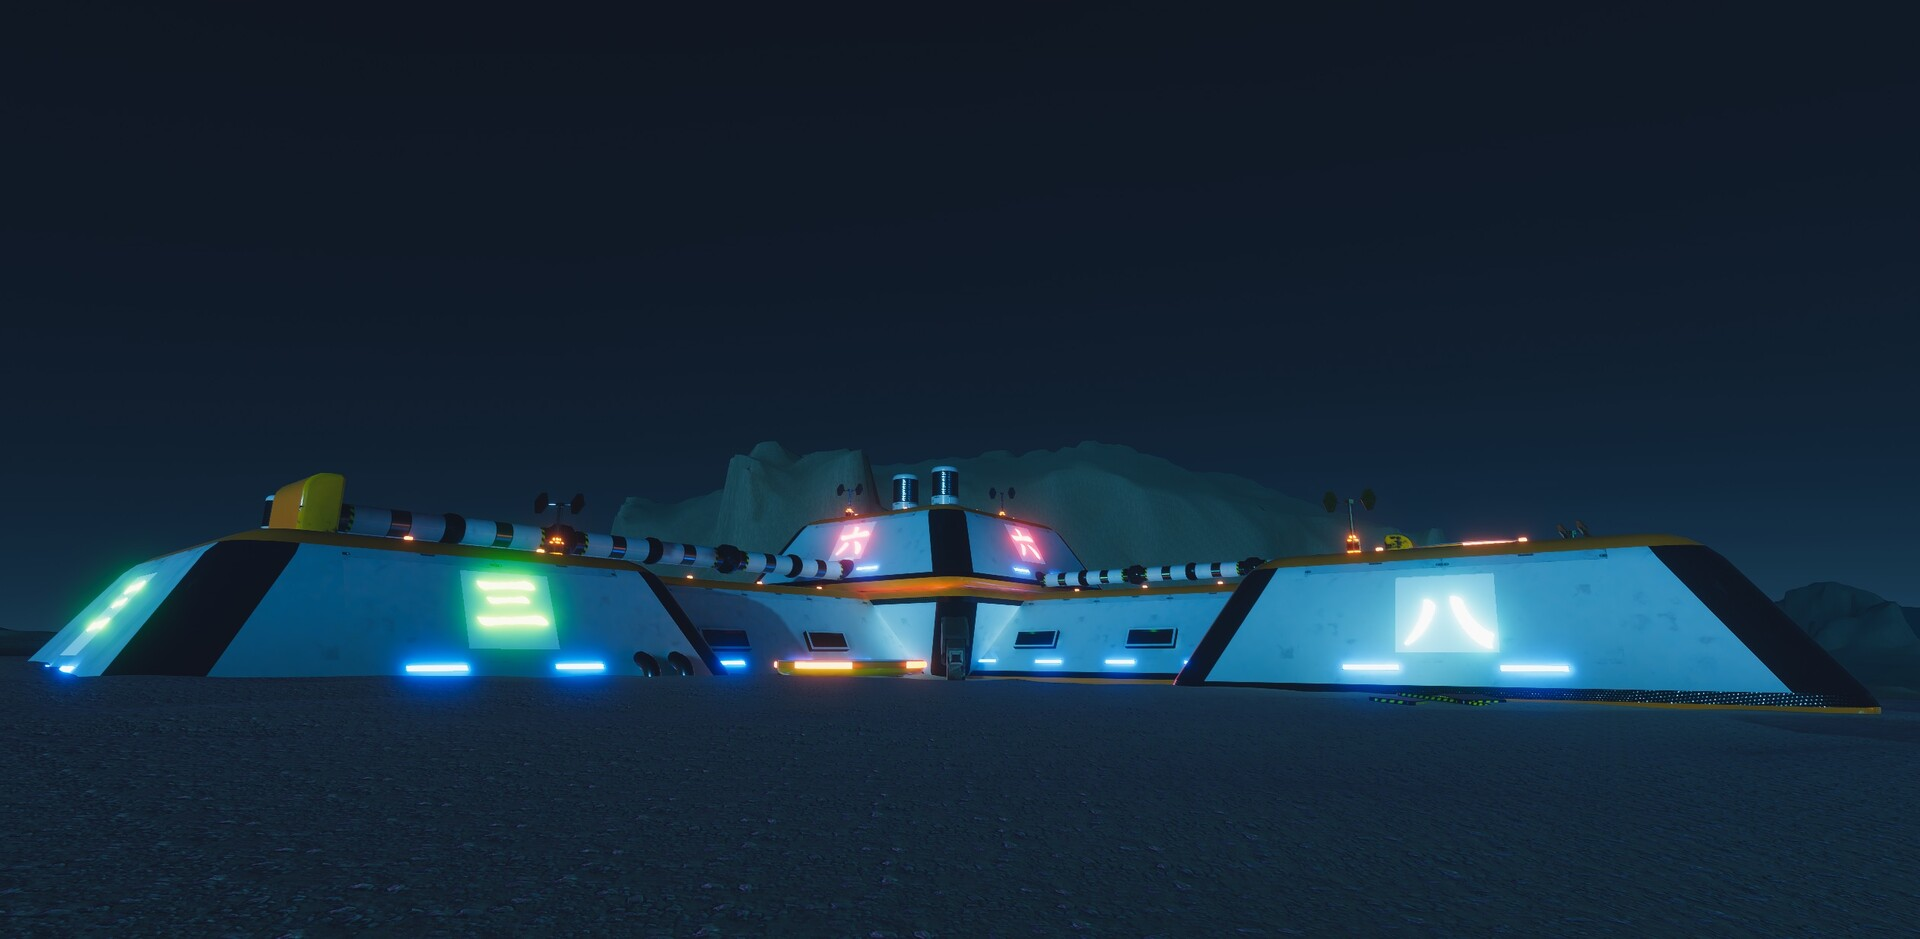 Enrico ottonello screenshot02 sci fi building exterior pack gameartifact